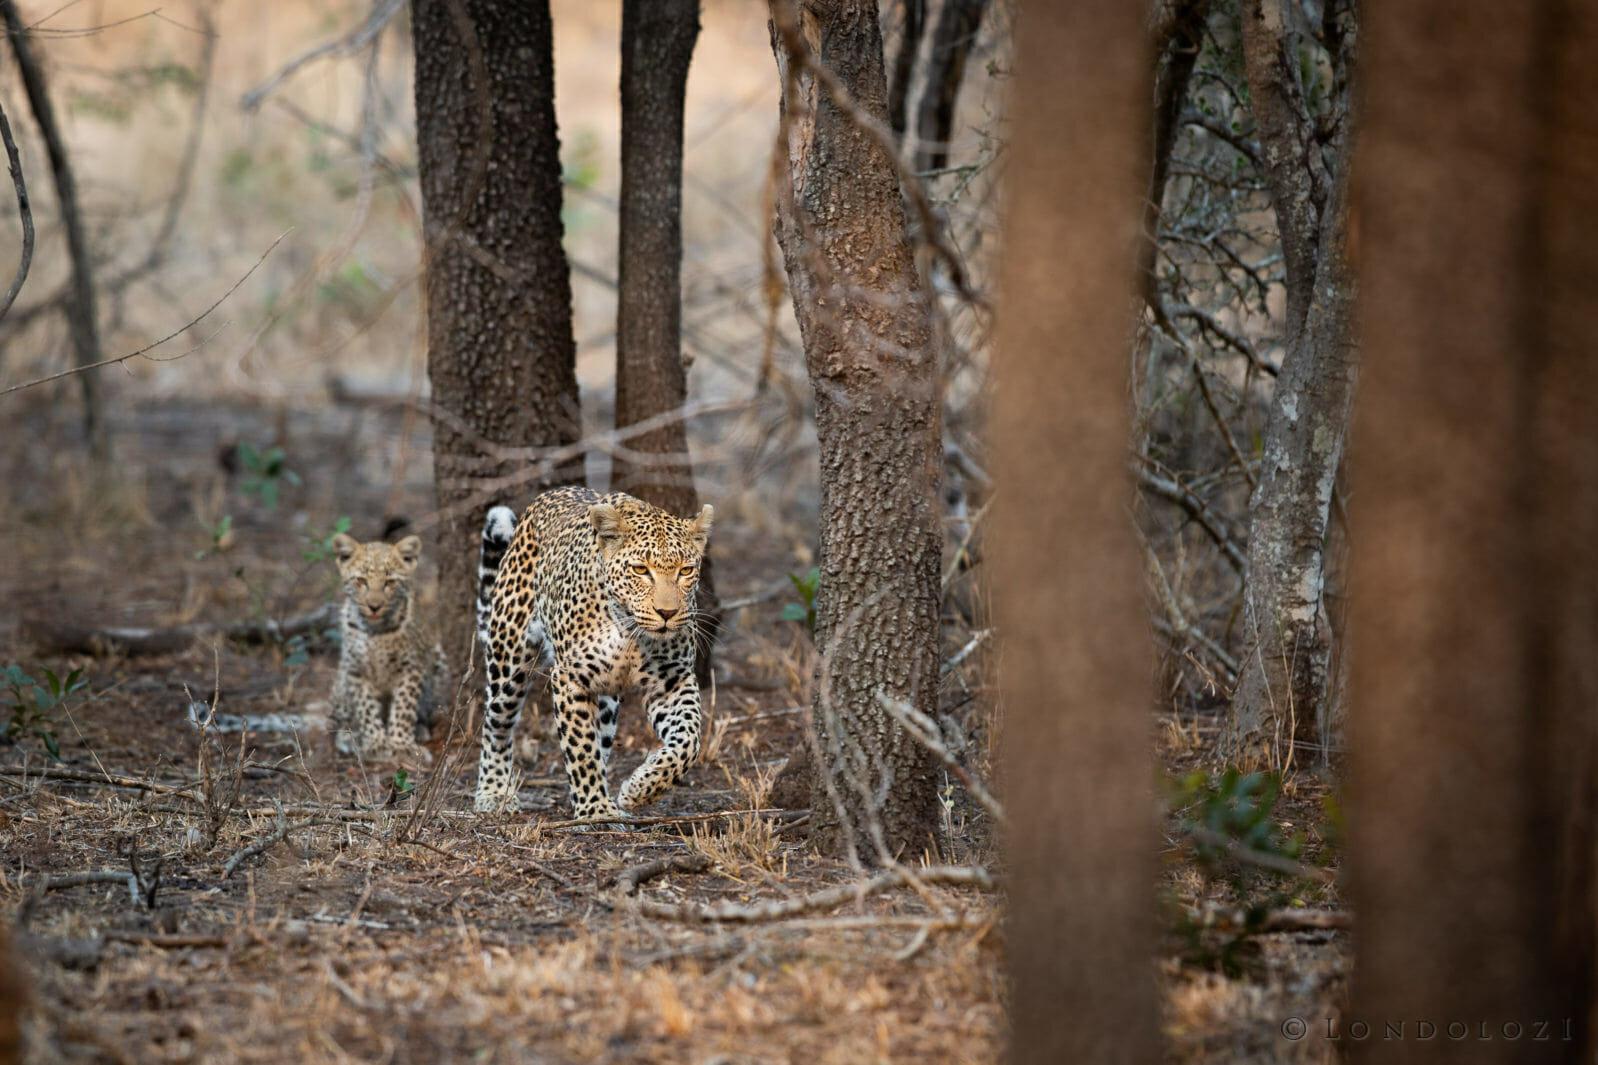 Nkoveni Female Leopard And Cub